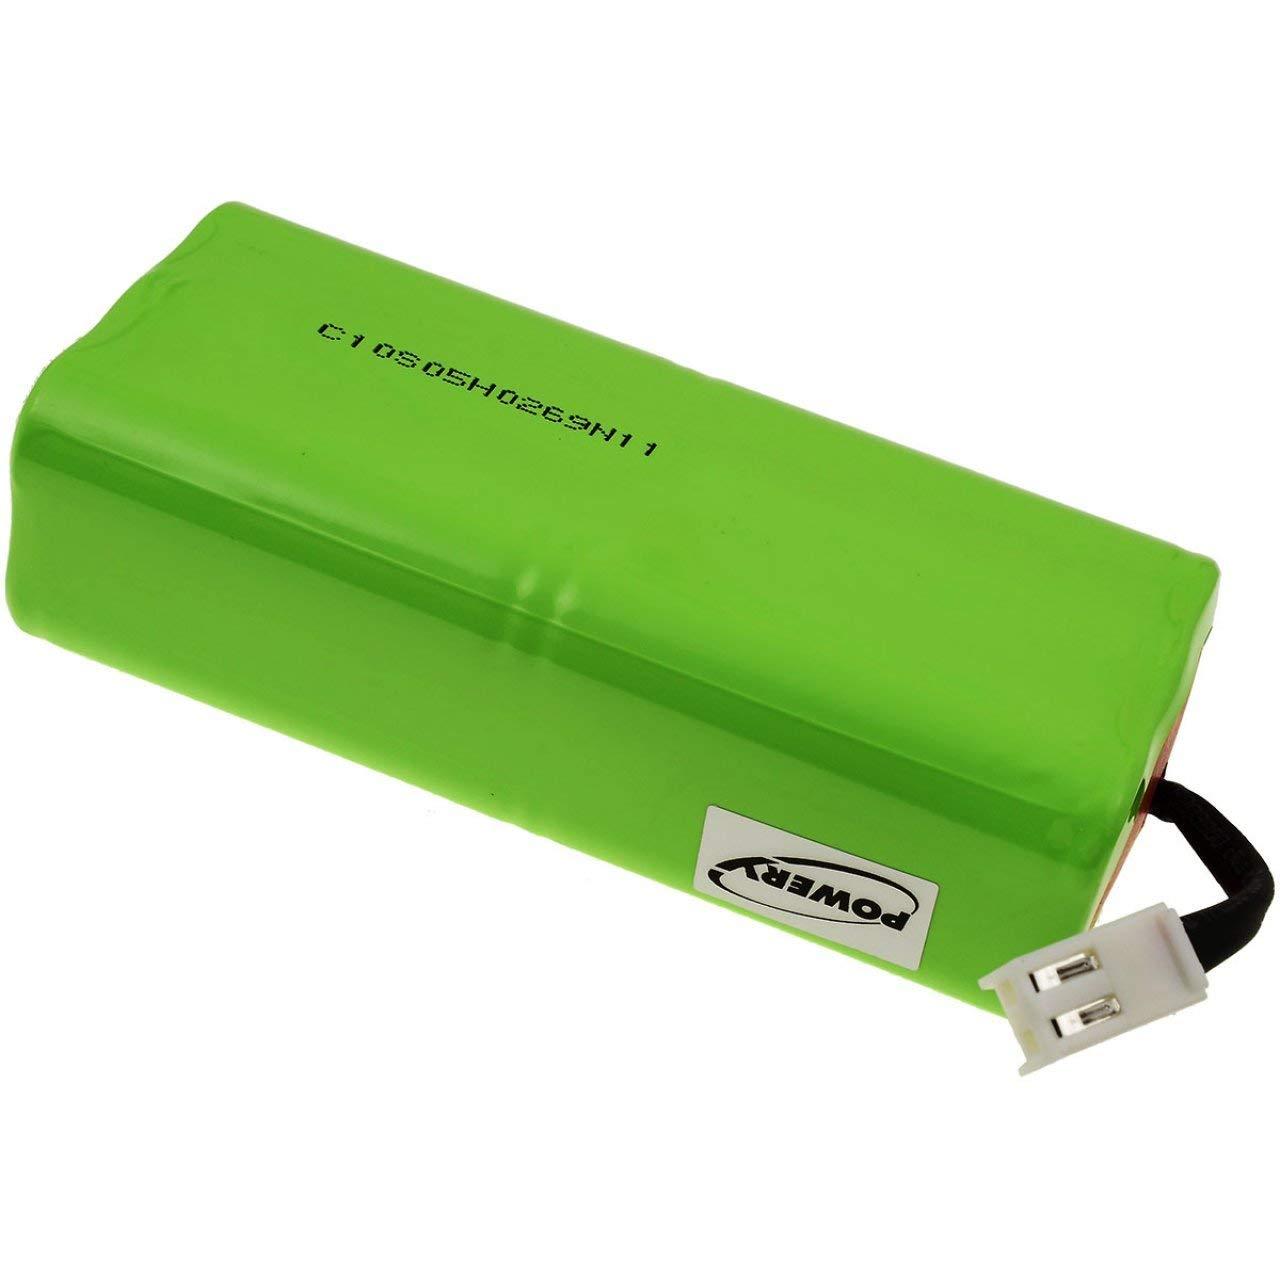 Powery Batería para Robot Aspirador Philips FC8800: Amazon.es: Electrónica